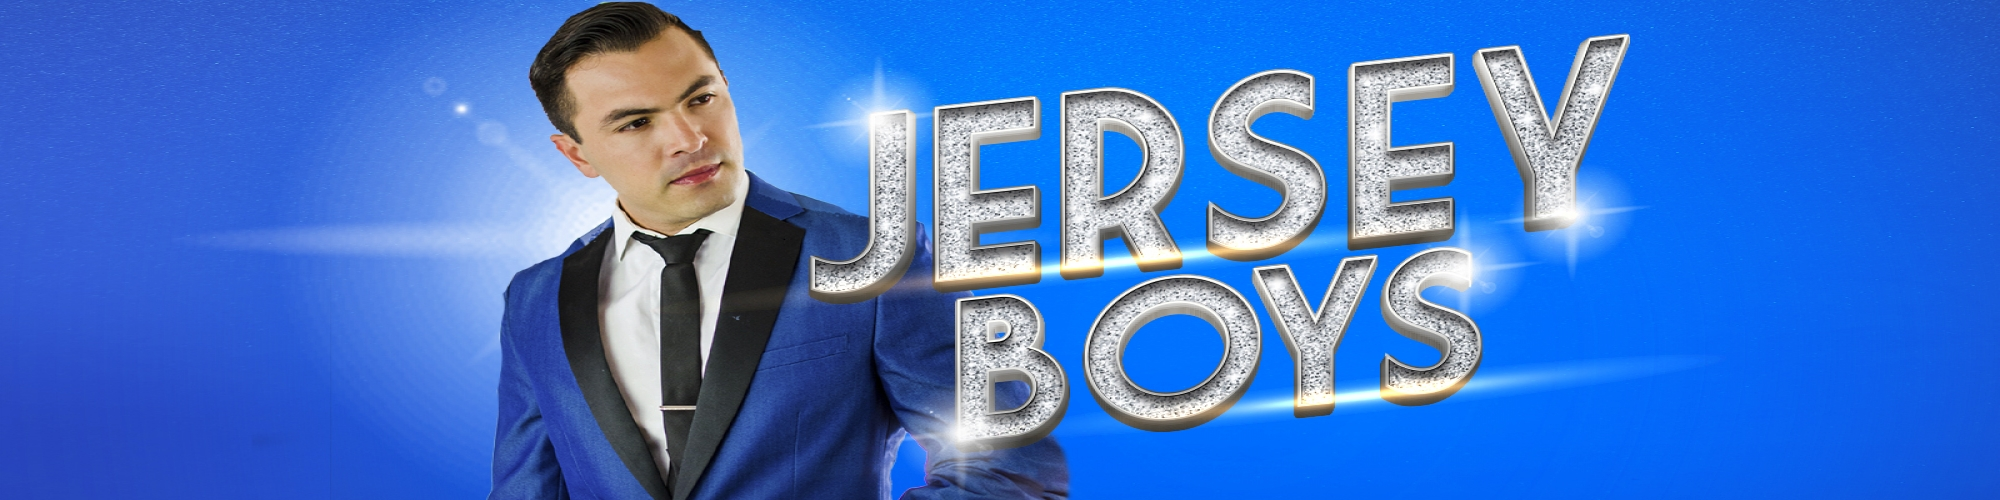 JERSEY BOYS starring Marc Lopez (Starlight Cabaret)